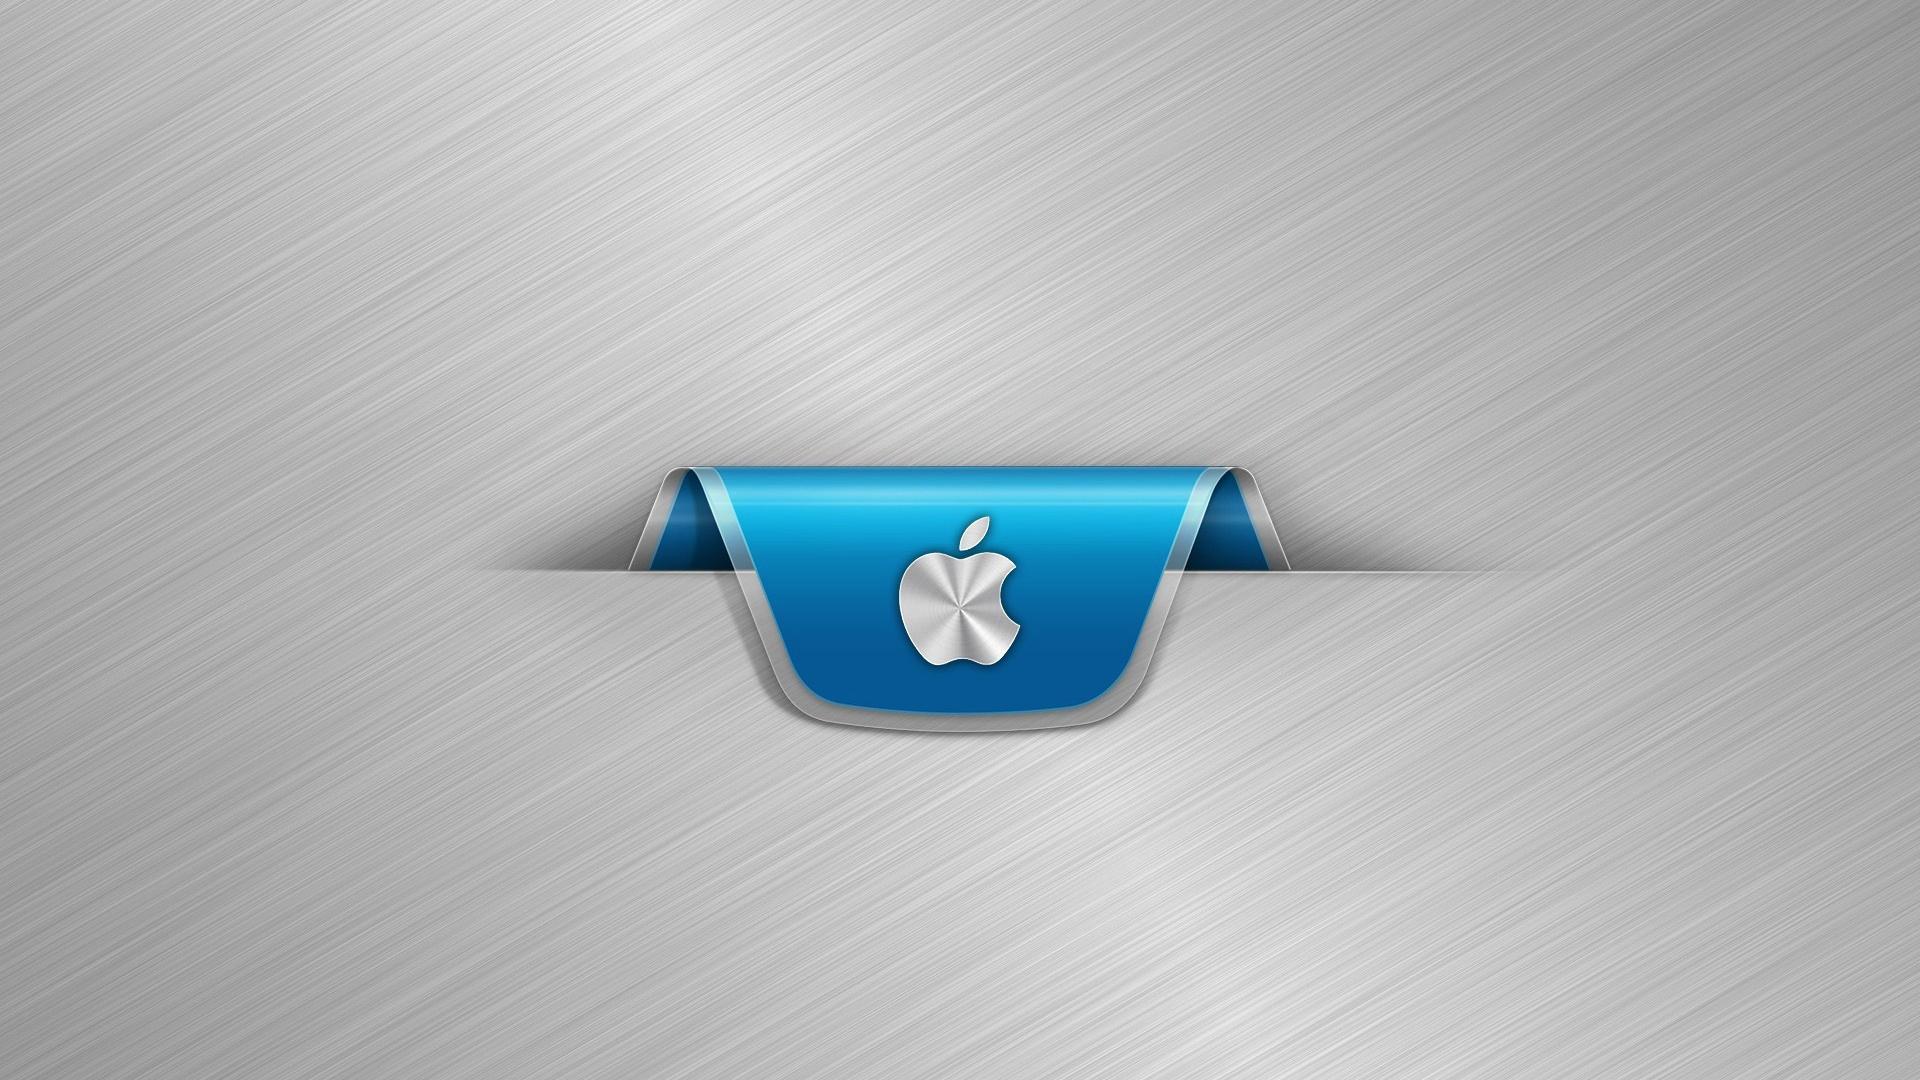 http://3.bp.blogspot.com/-yCMEmYC6y9A/UKZLqhNr3rI/AAAAAAAAO0w/eqkUdFIxDNU/s0/apple-silver-1920x1080.jpg